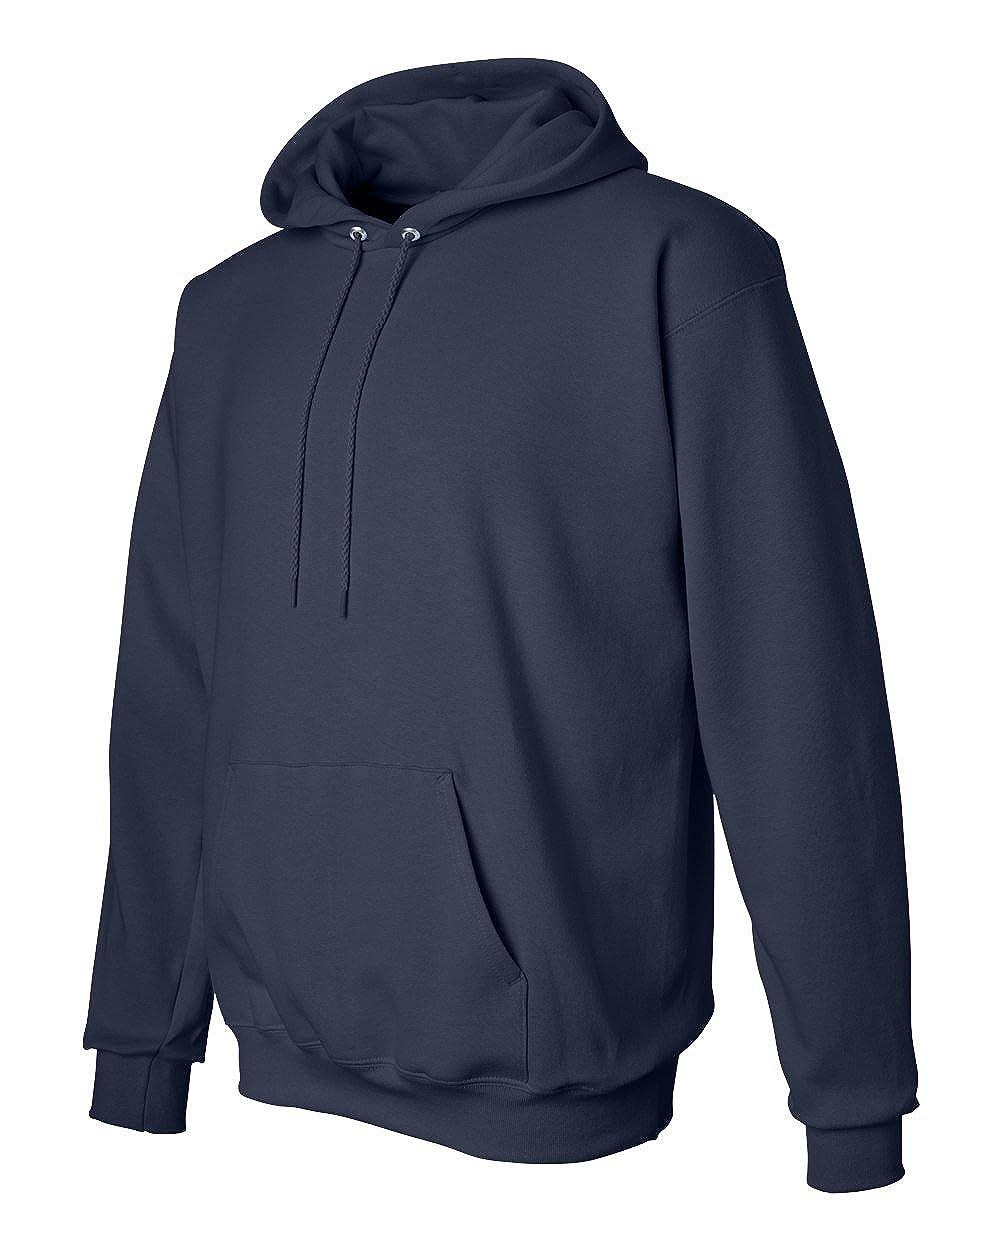 Ultimate Cotton 90//10 Pullover Hood Hanes 9.7 oz